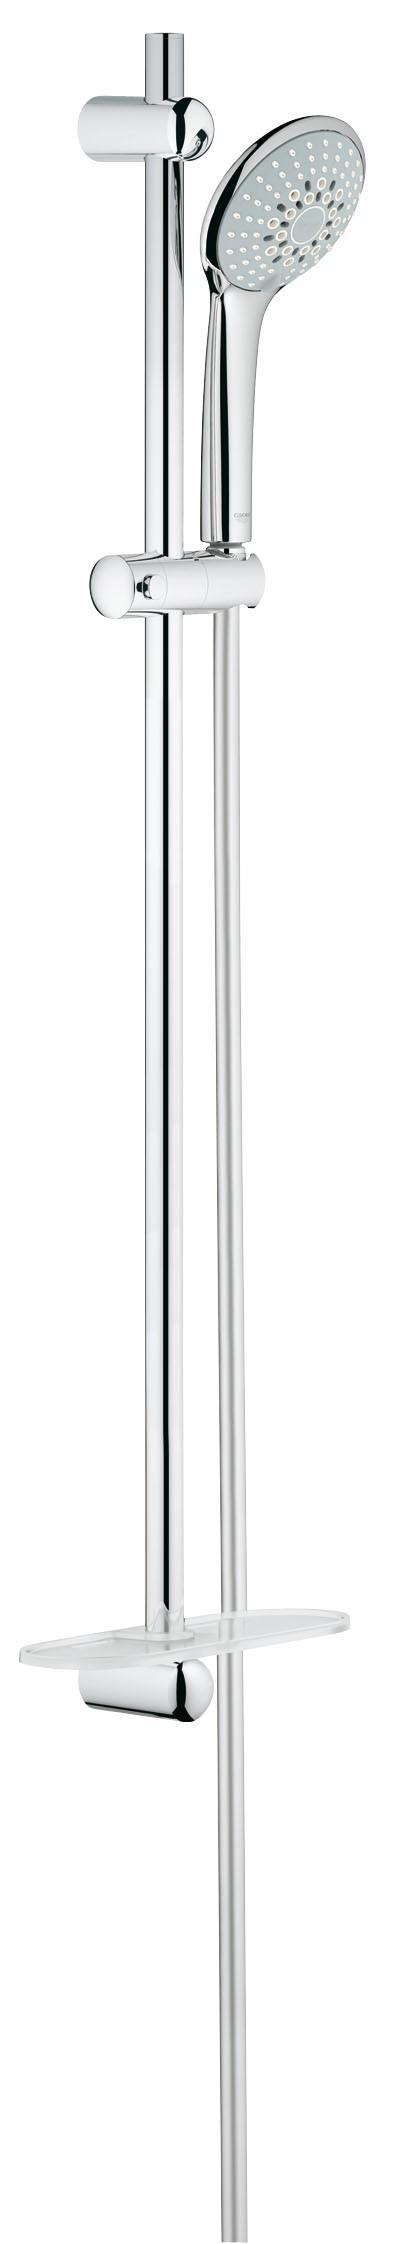 Grohe 27227001 Euphoria (ручной душ, штанга 900 мм, шланг 1750 мм), хром (27227001)